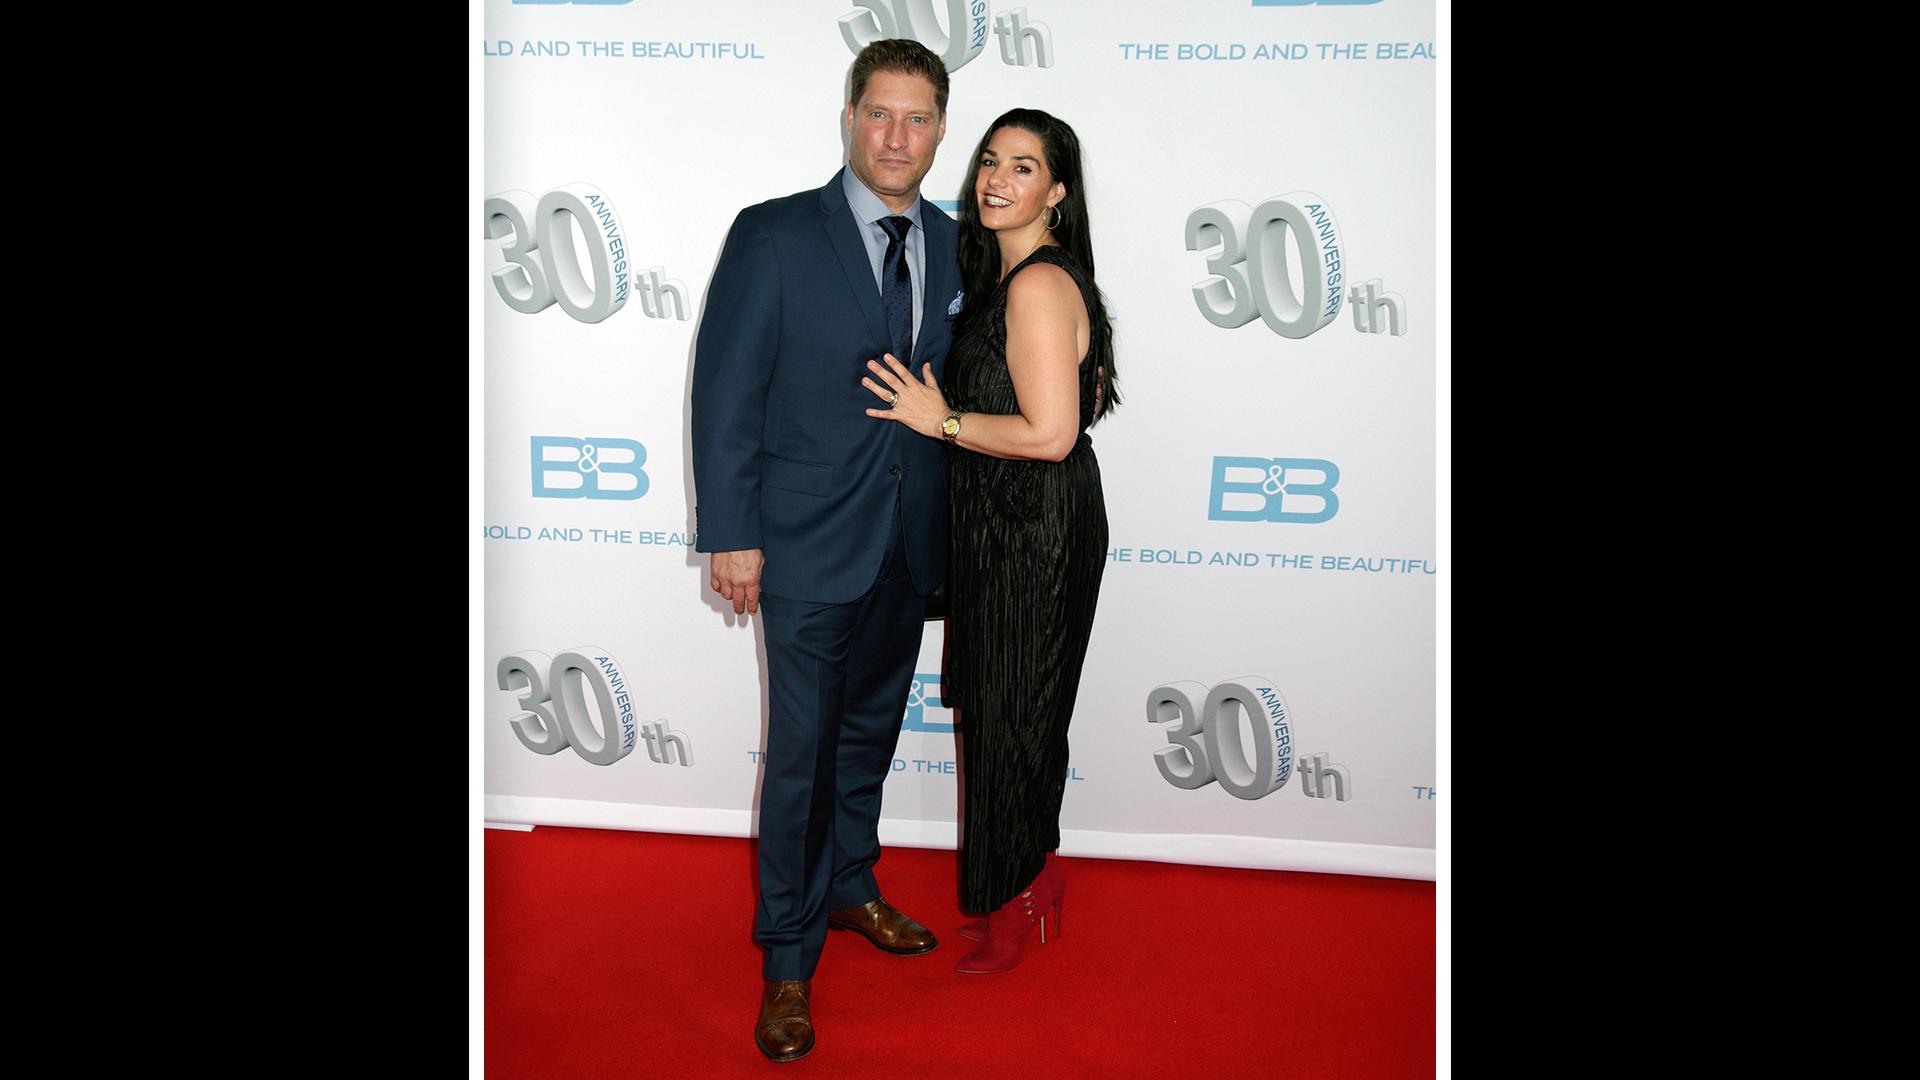 Sean Kanan makes an entrance with his wife, Michele Vega.